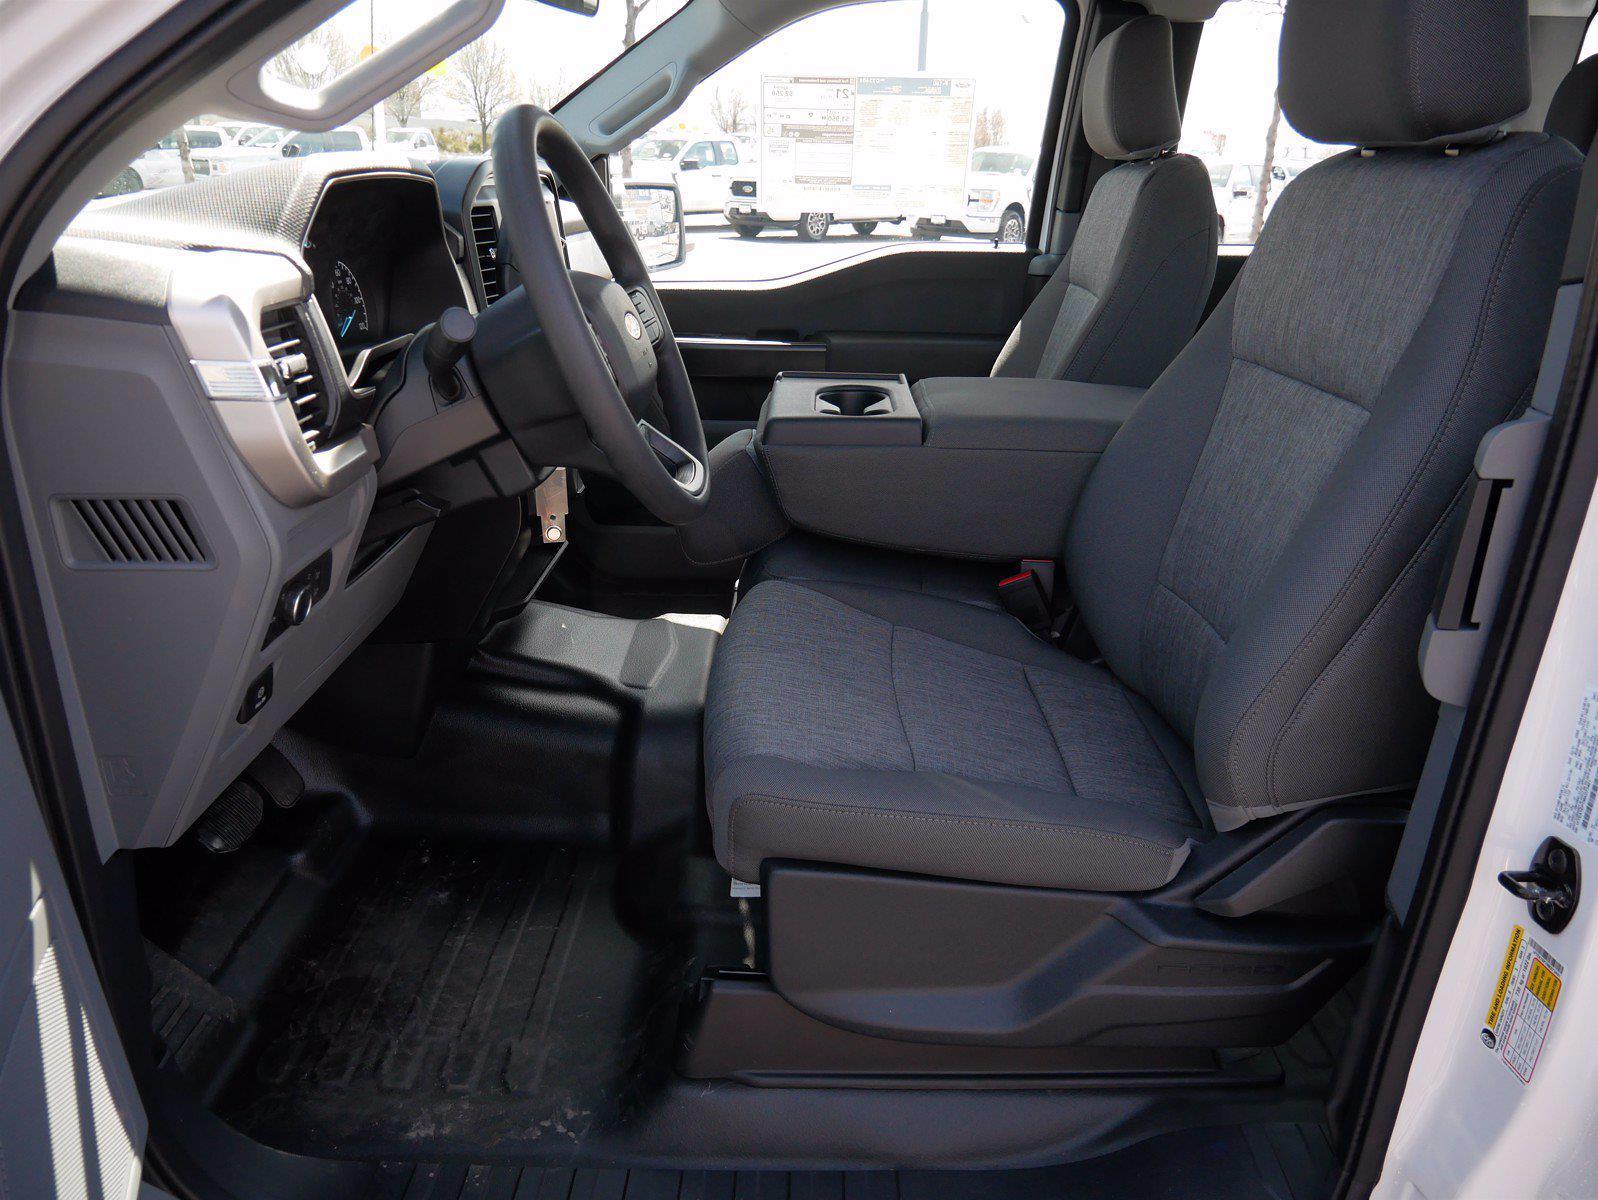 2021 Ford F-150 Super Cab 4x4, Pickup #64068 - photo 13